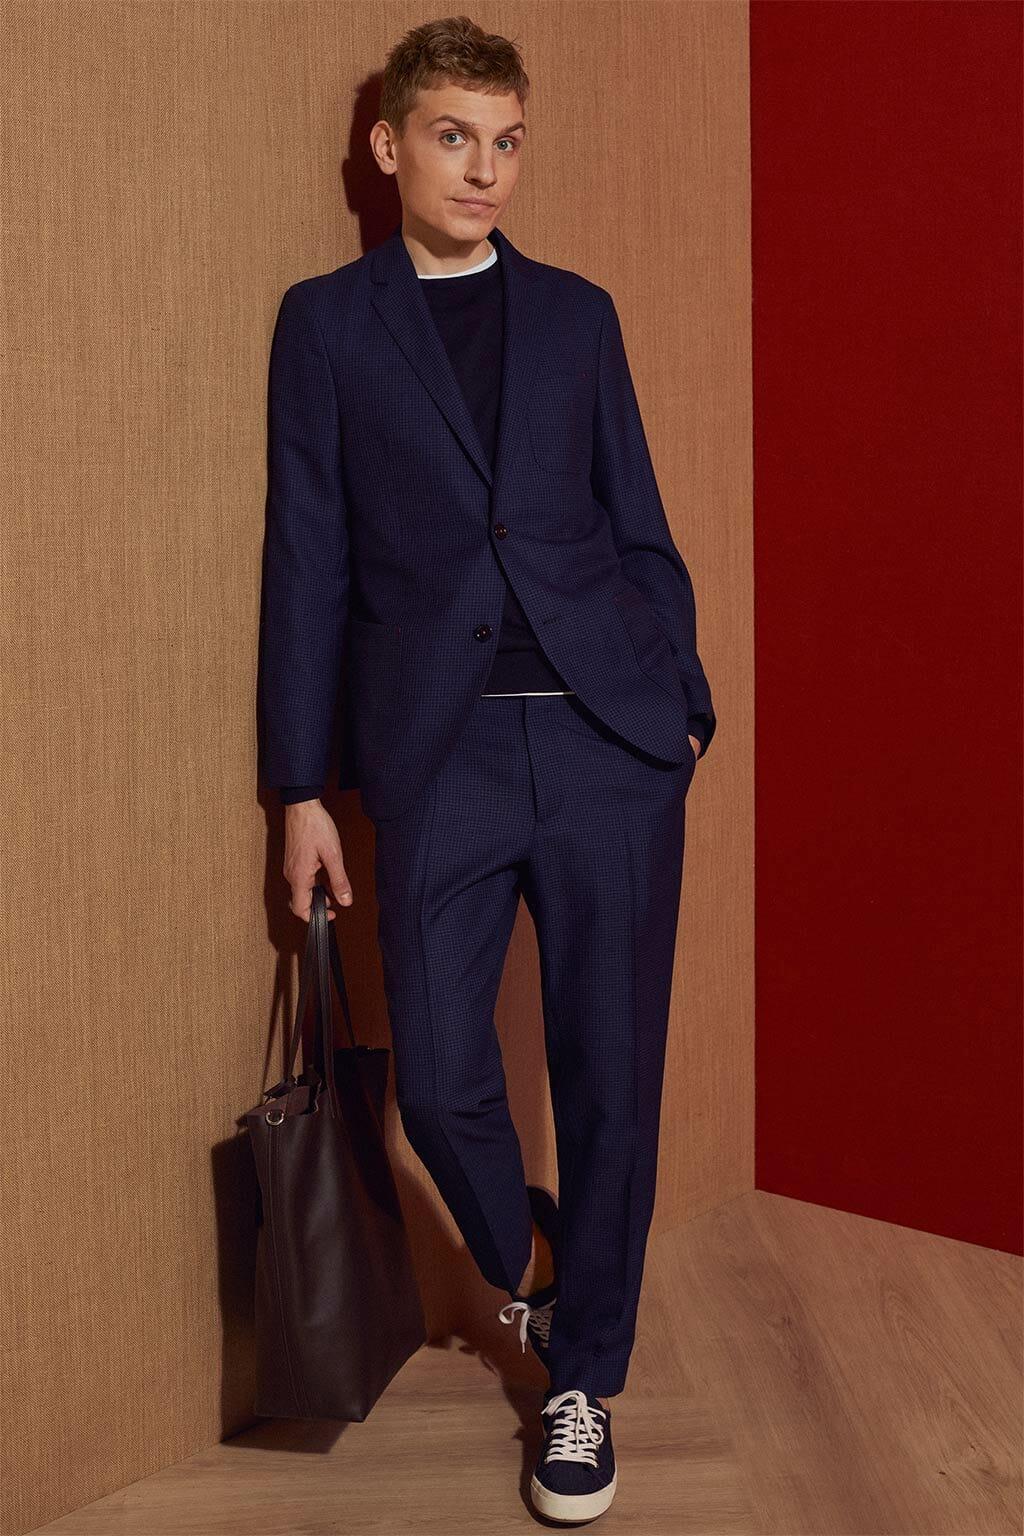 CH Carolina Herrera. New Menswear Collection Early Summer. Look 03